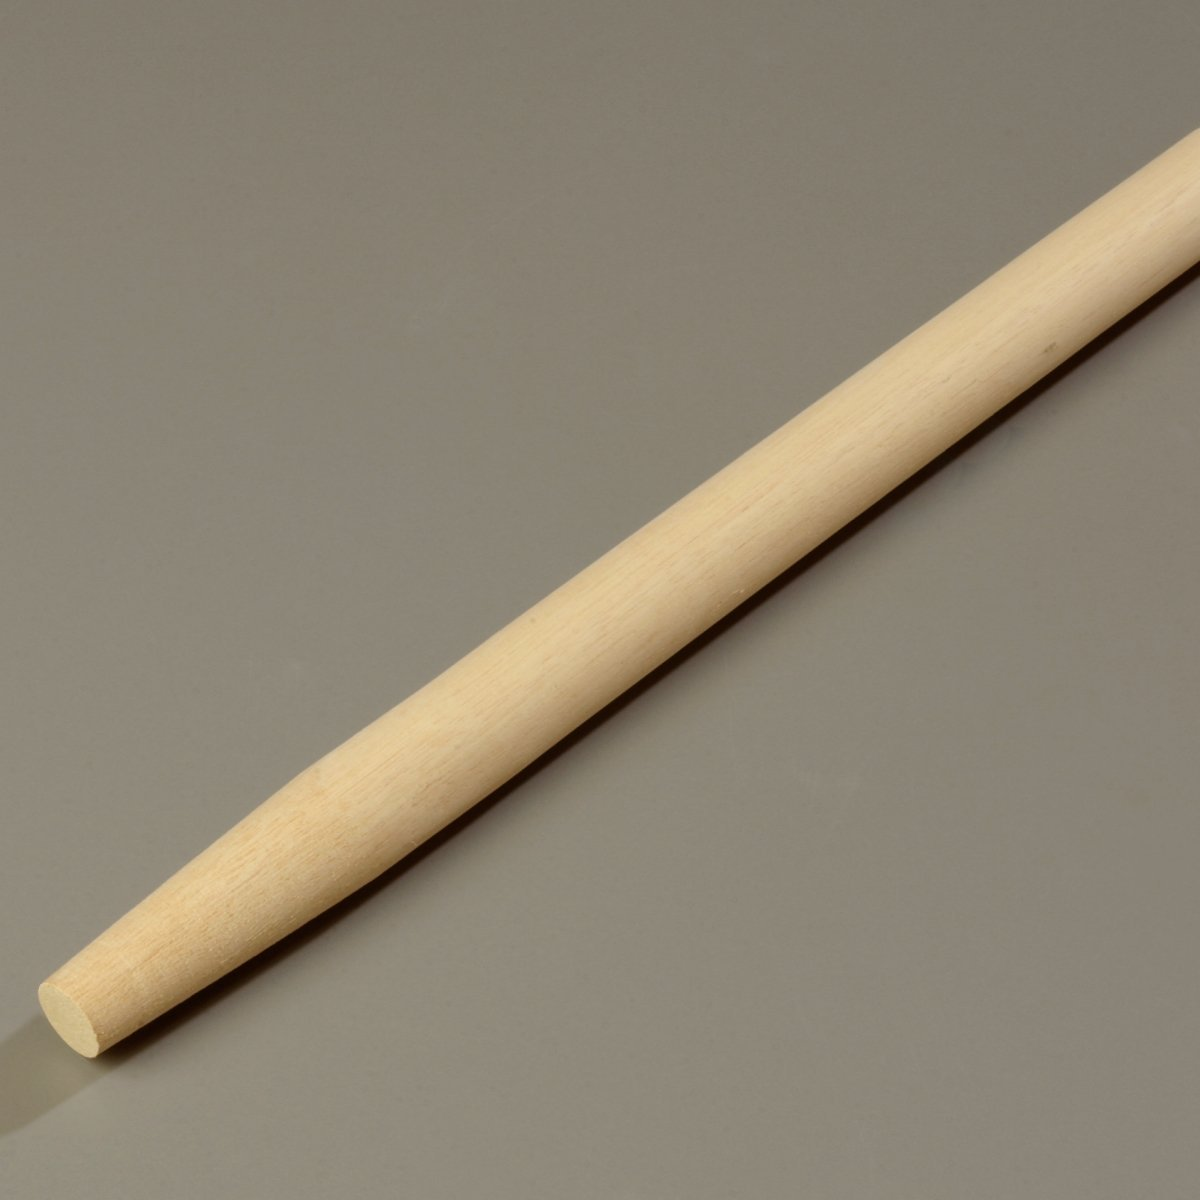 Carlisle 4026200 Flo-Pac Hardwood Tapered Handle, 1-1/8'' Dia. x 60'' L (Case of 12) by Carlisle (Image #5)